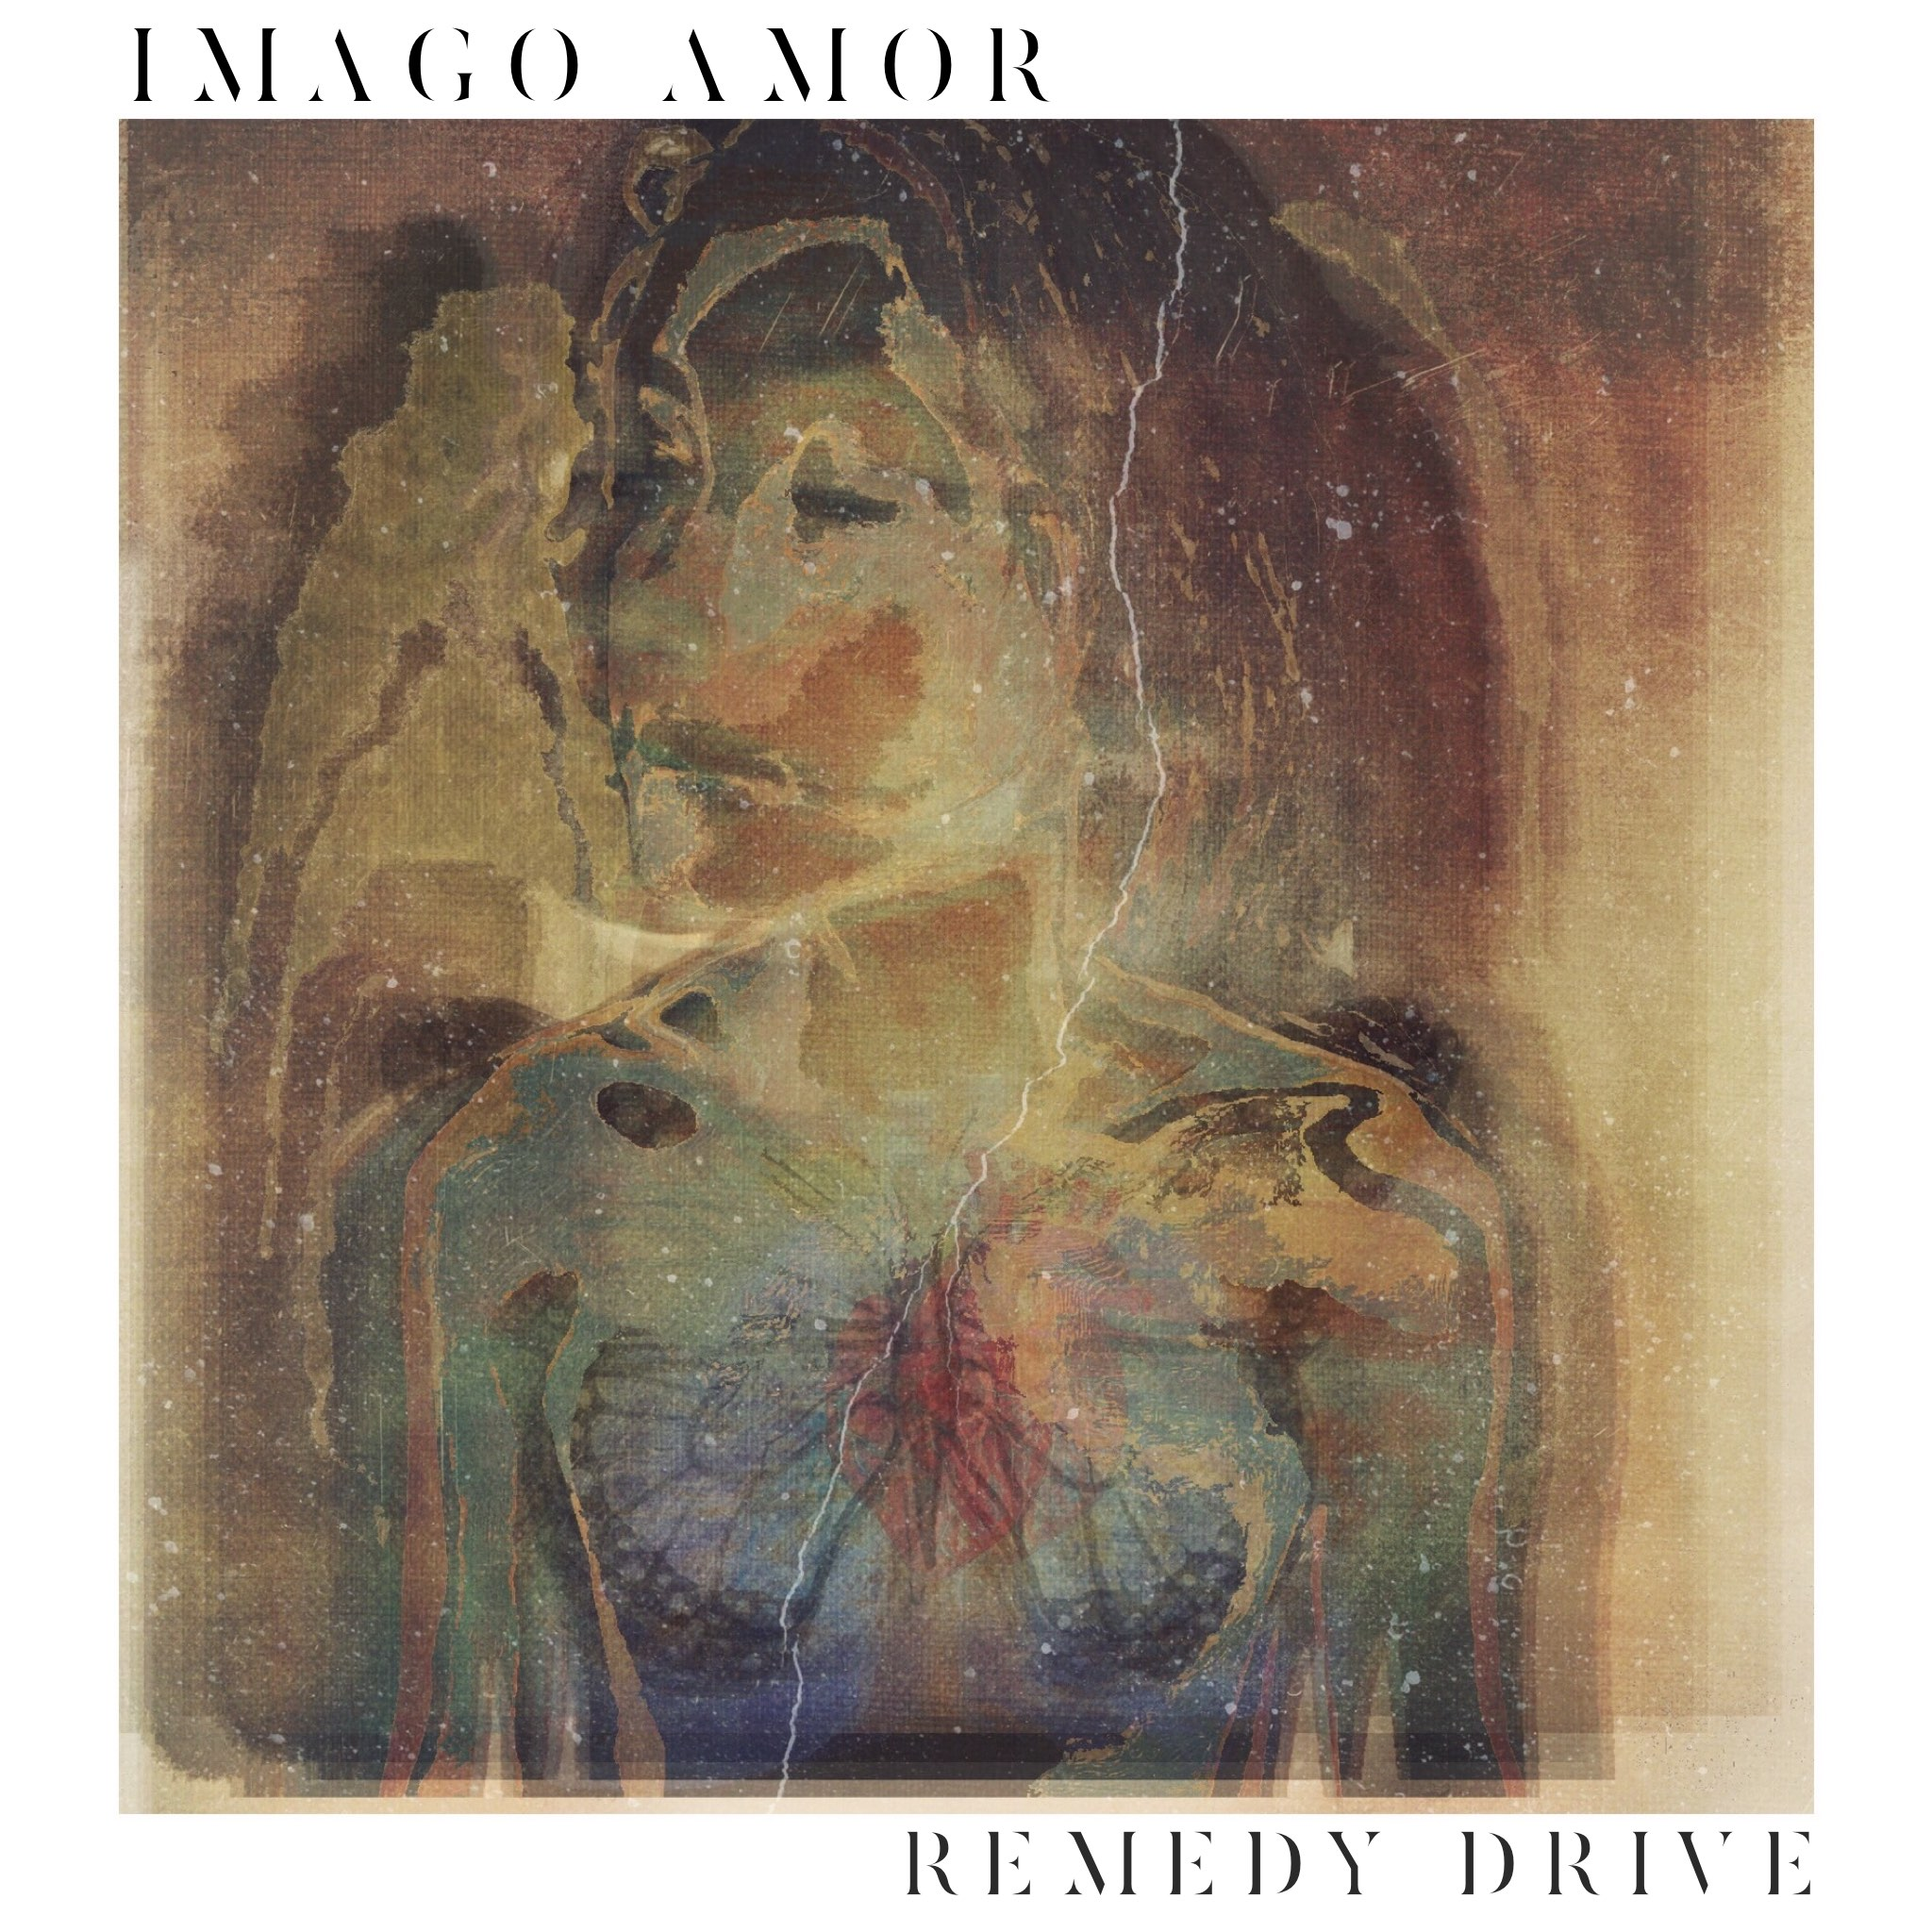 Music News: REMEDY DRIVE UNVEILS 'IMAGO AMOR' JANUARY 29